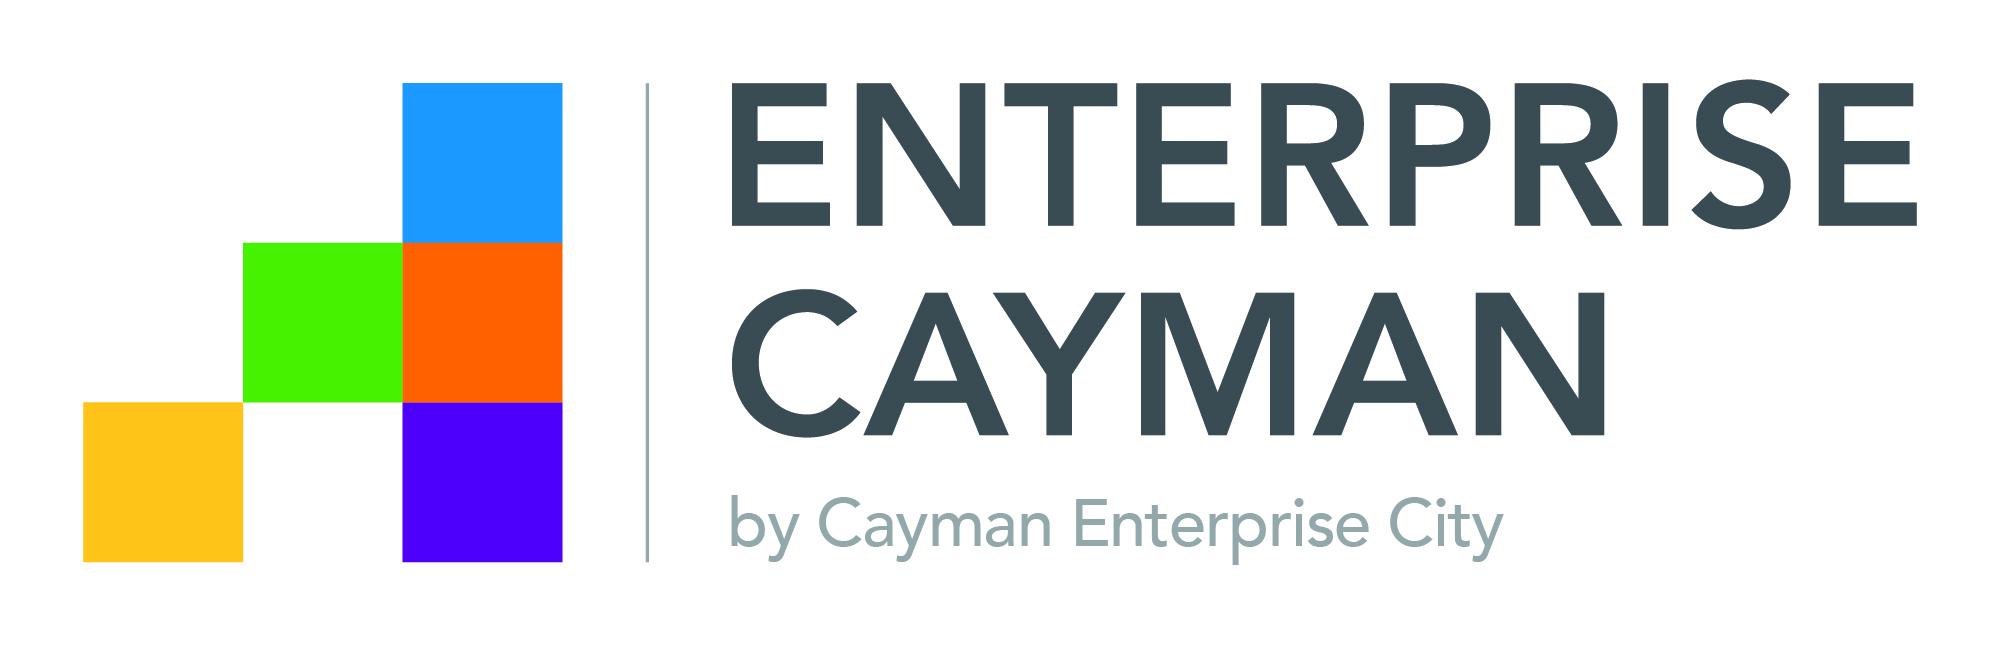 Enterprise Cayman - Full Colour_1